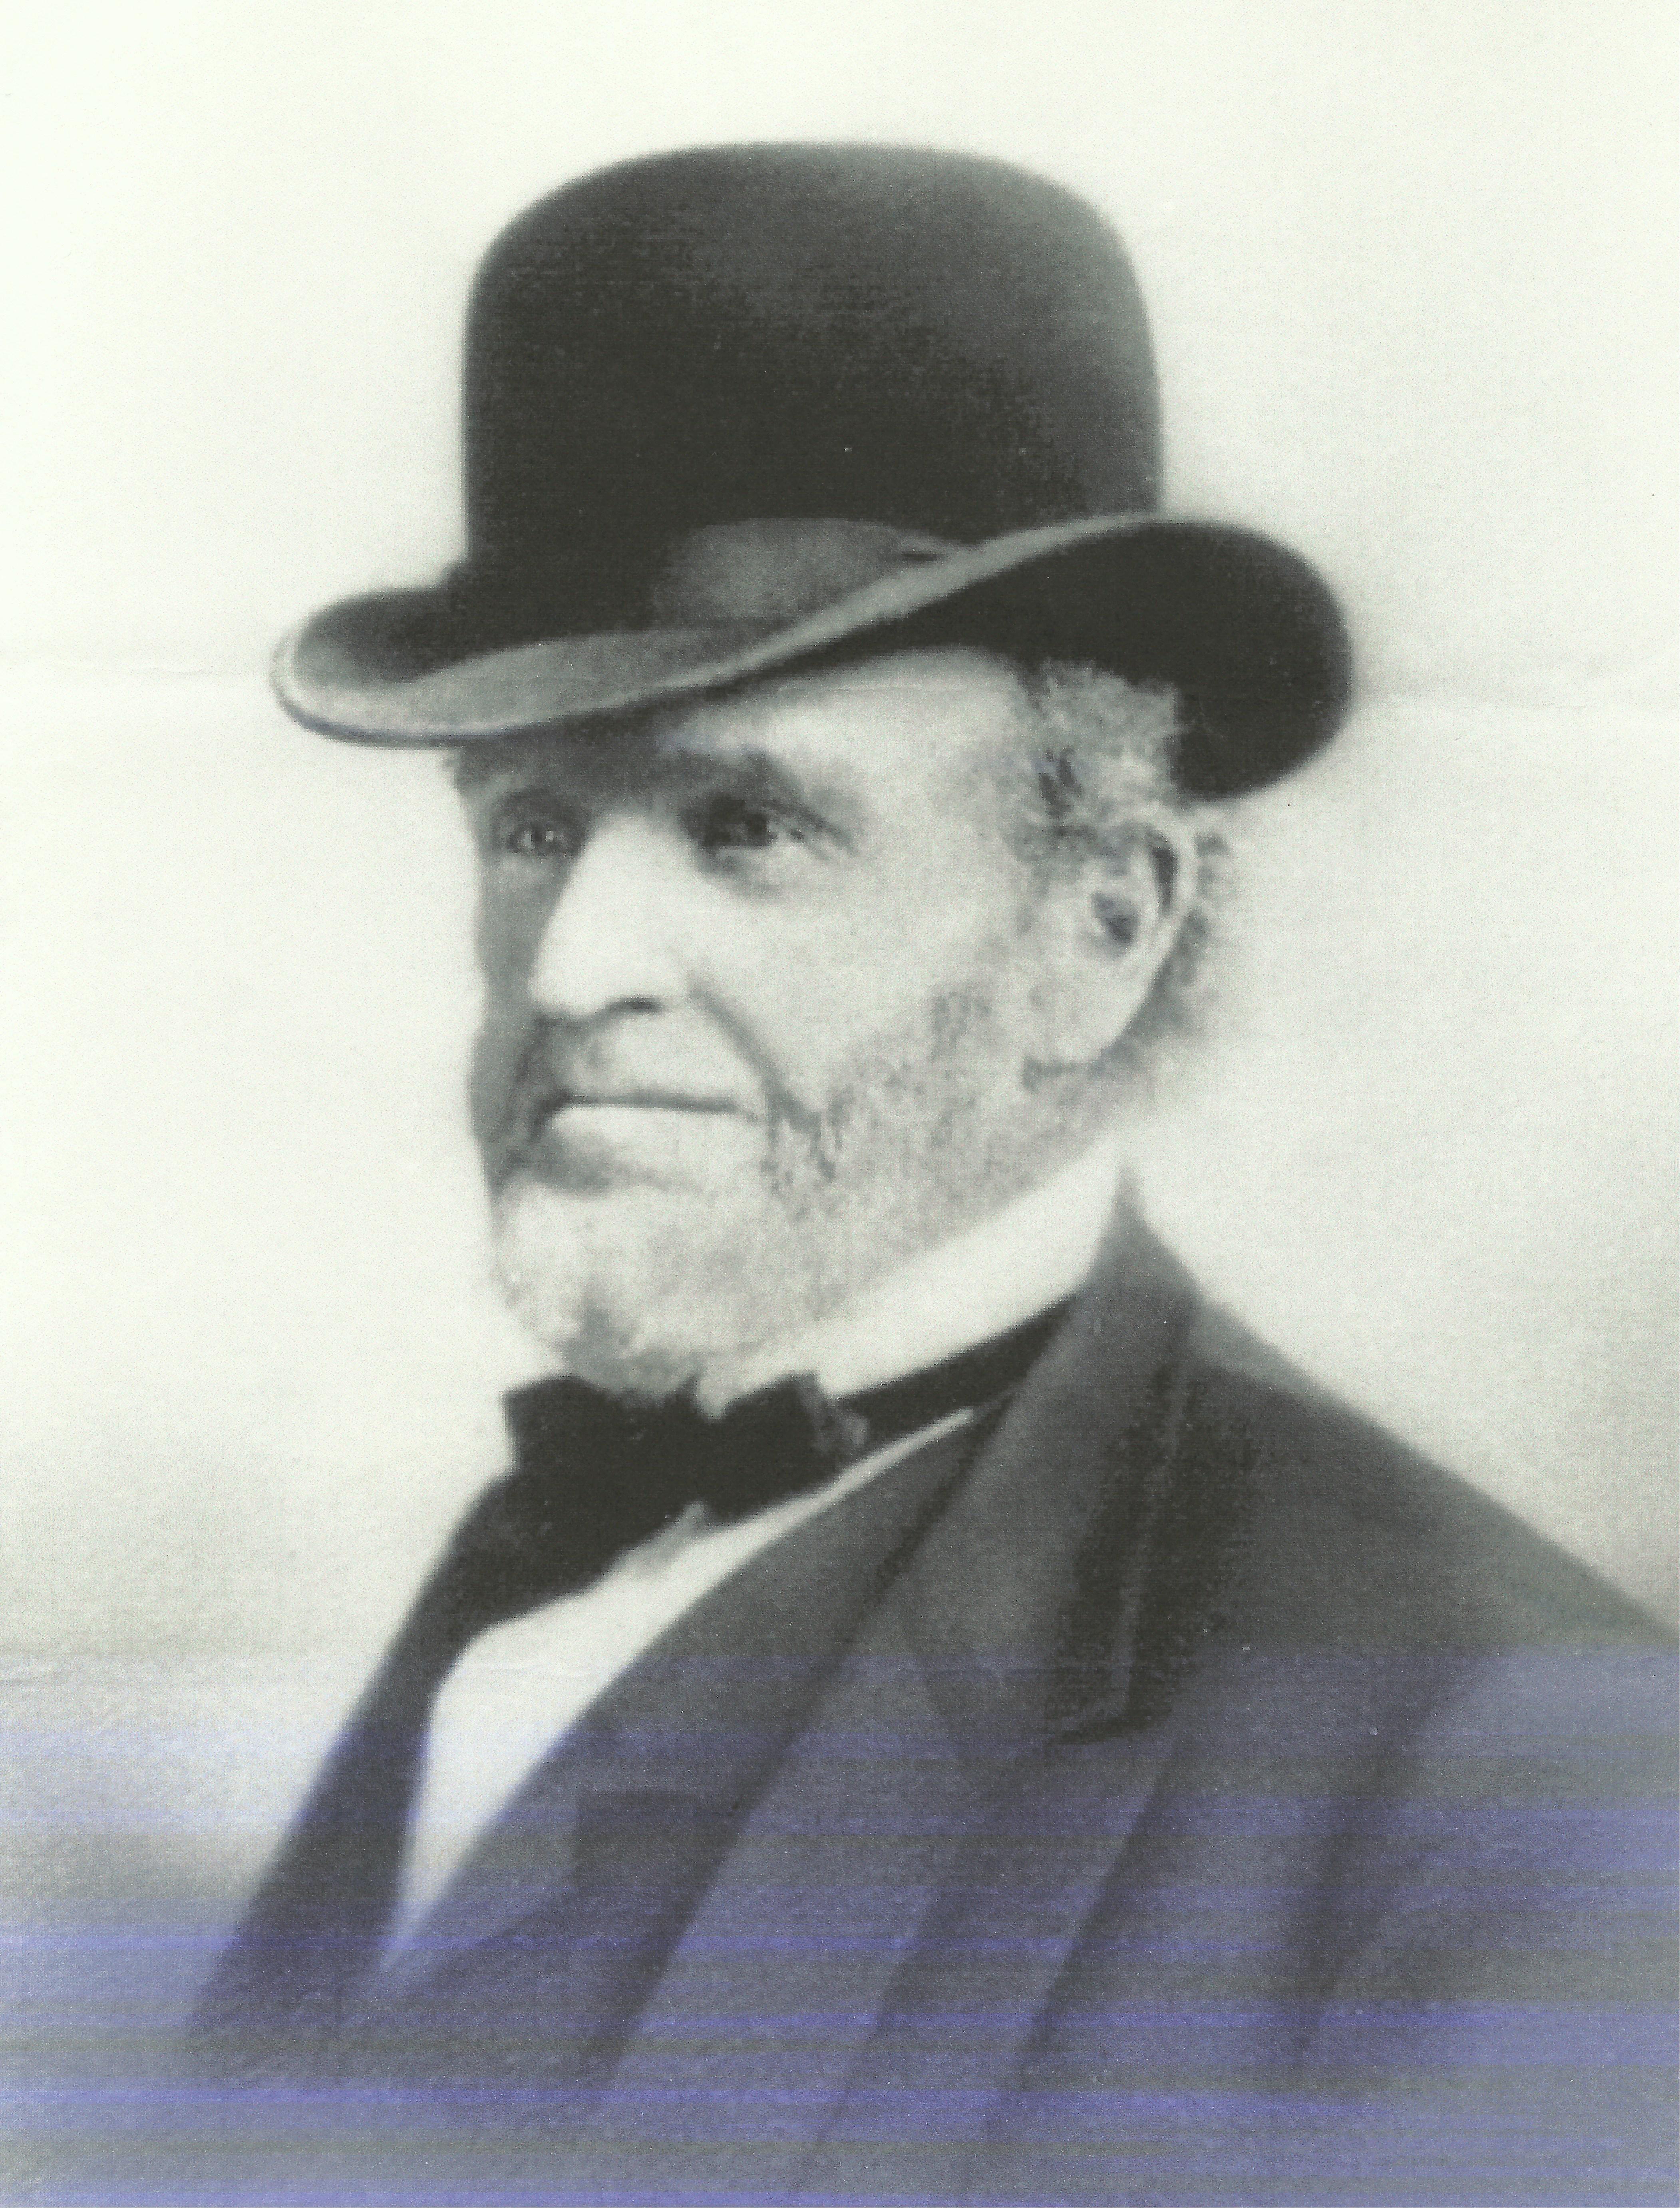 Alabama tallapoosa county - Confederates And Doughboys